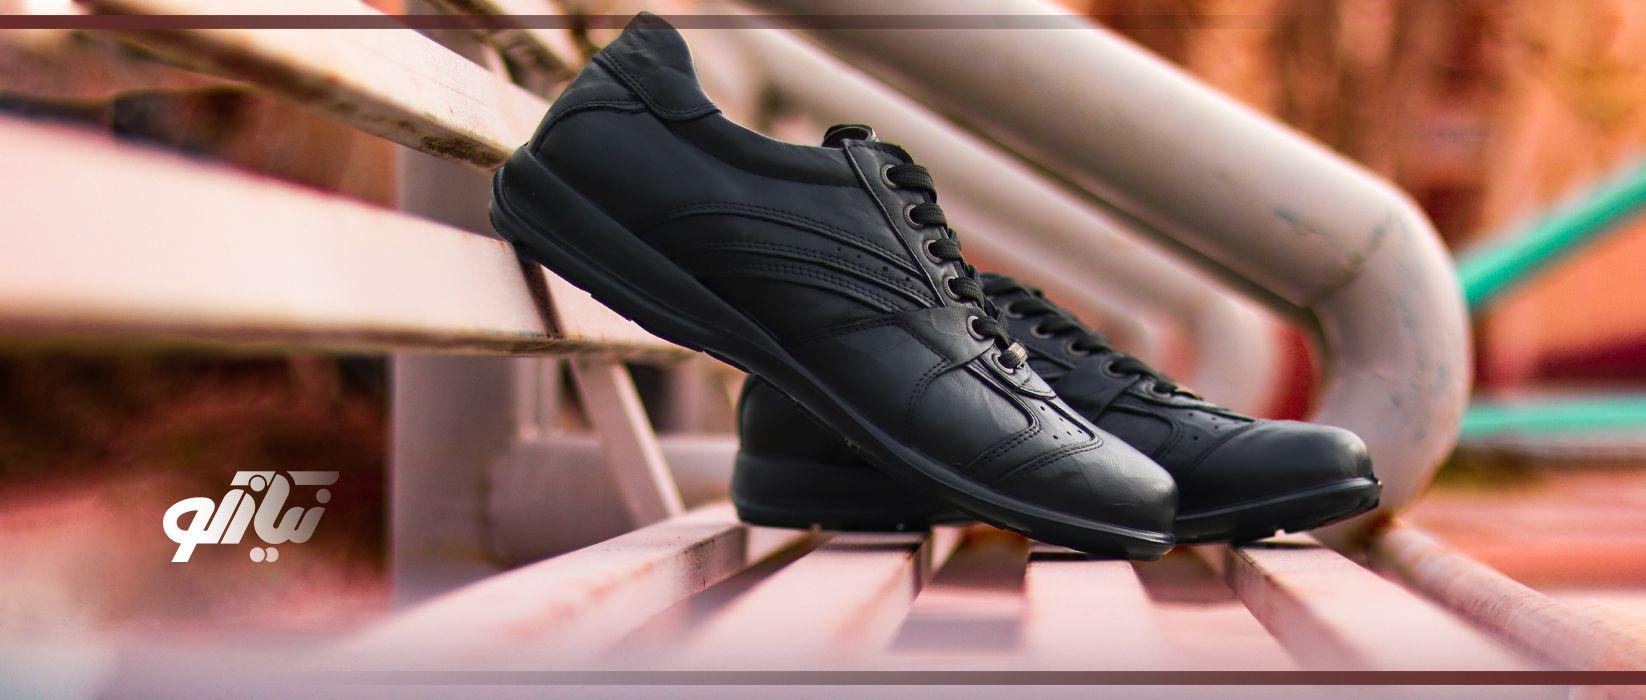 کفش اسپورت شیک همگام مدل 106